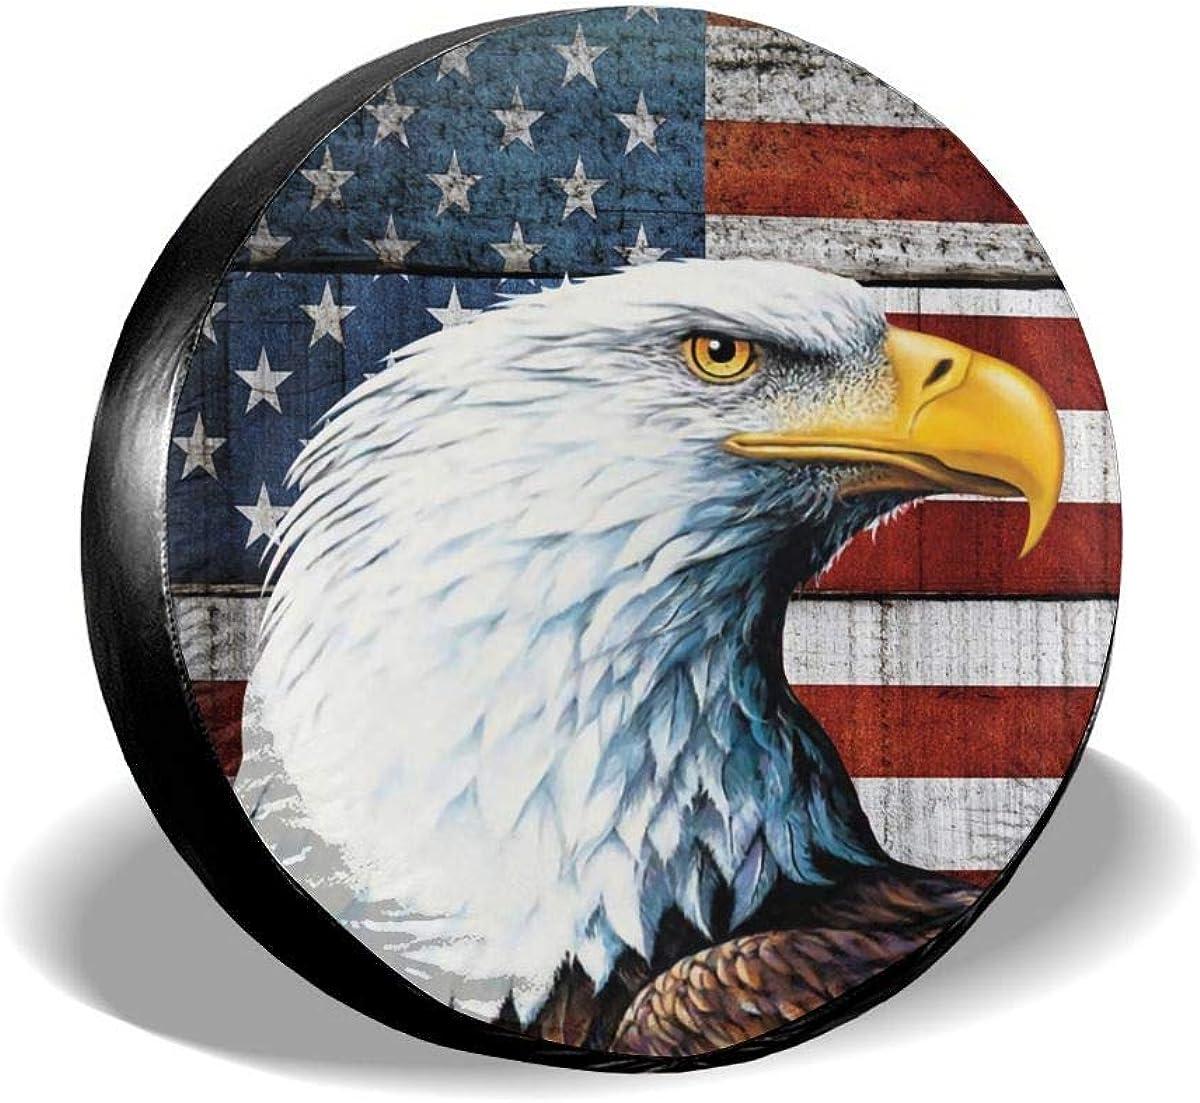 YZ-MAMU American Flag List price Portland Mall Eagle Spare Tire Waterproof Cover Dust-Pro